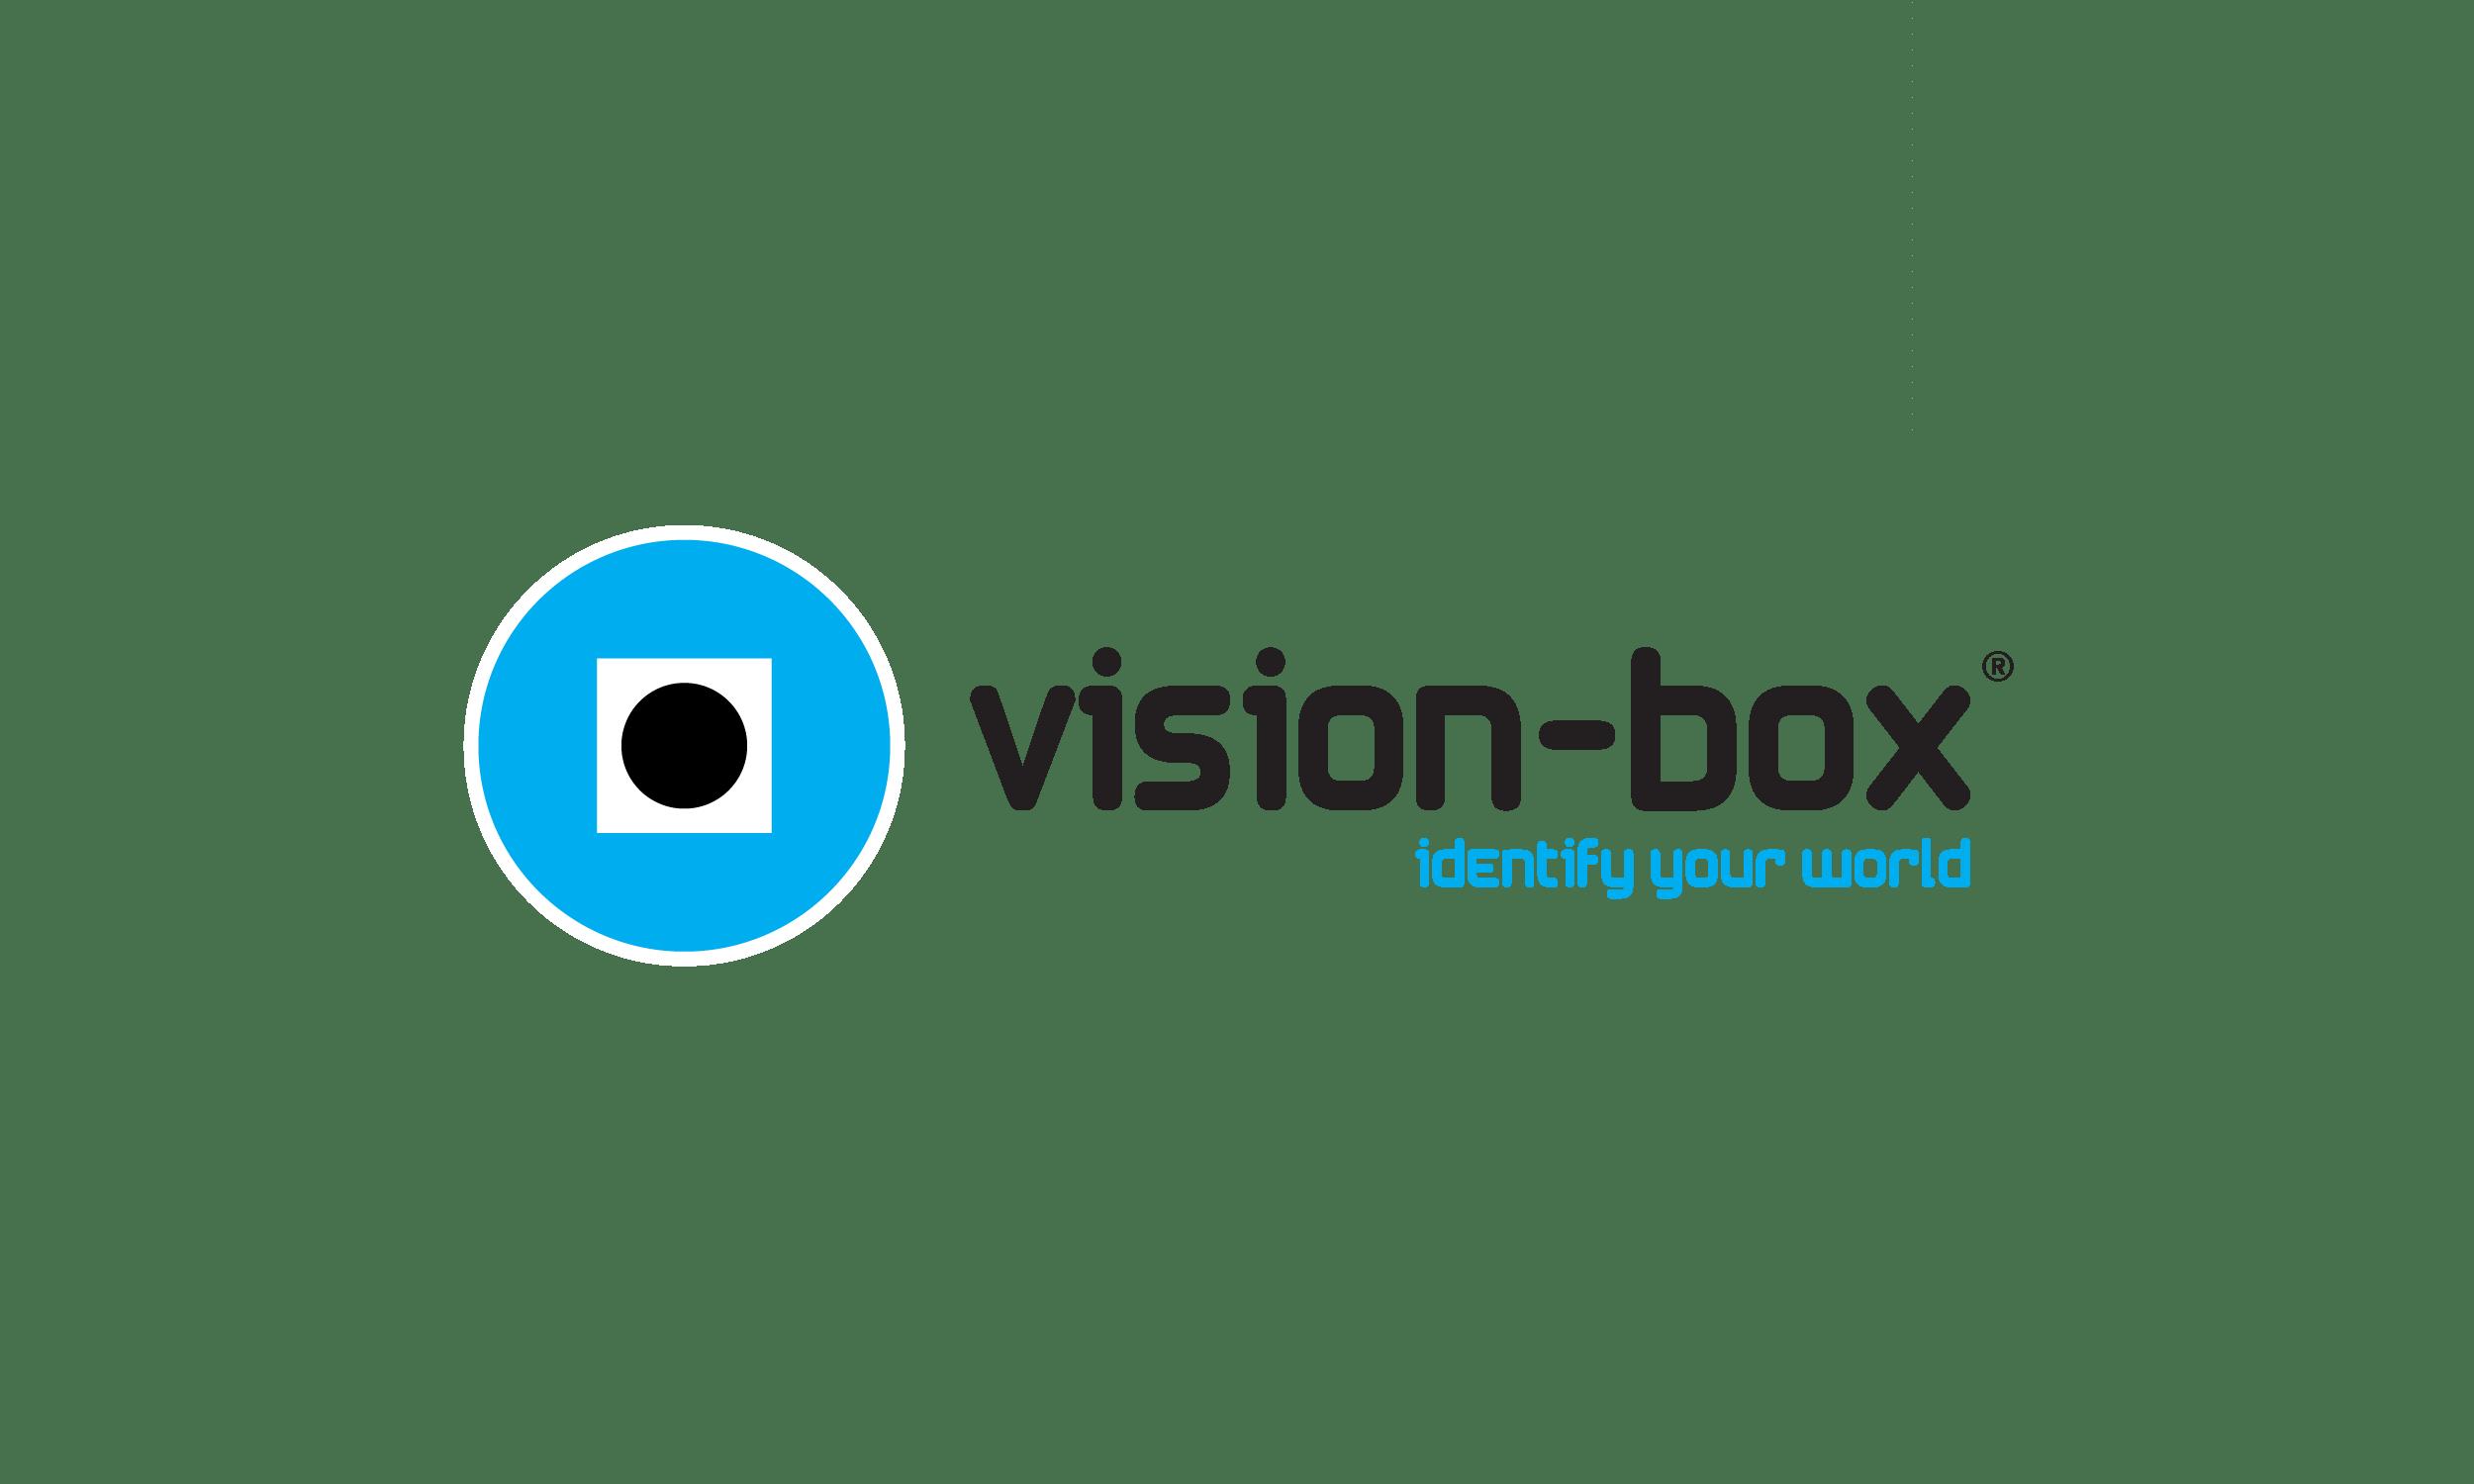 Danish Government Awards Vision-Box® and Biometric